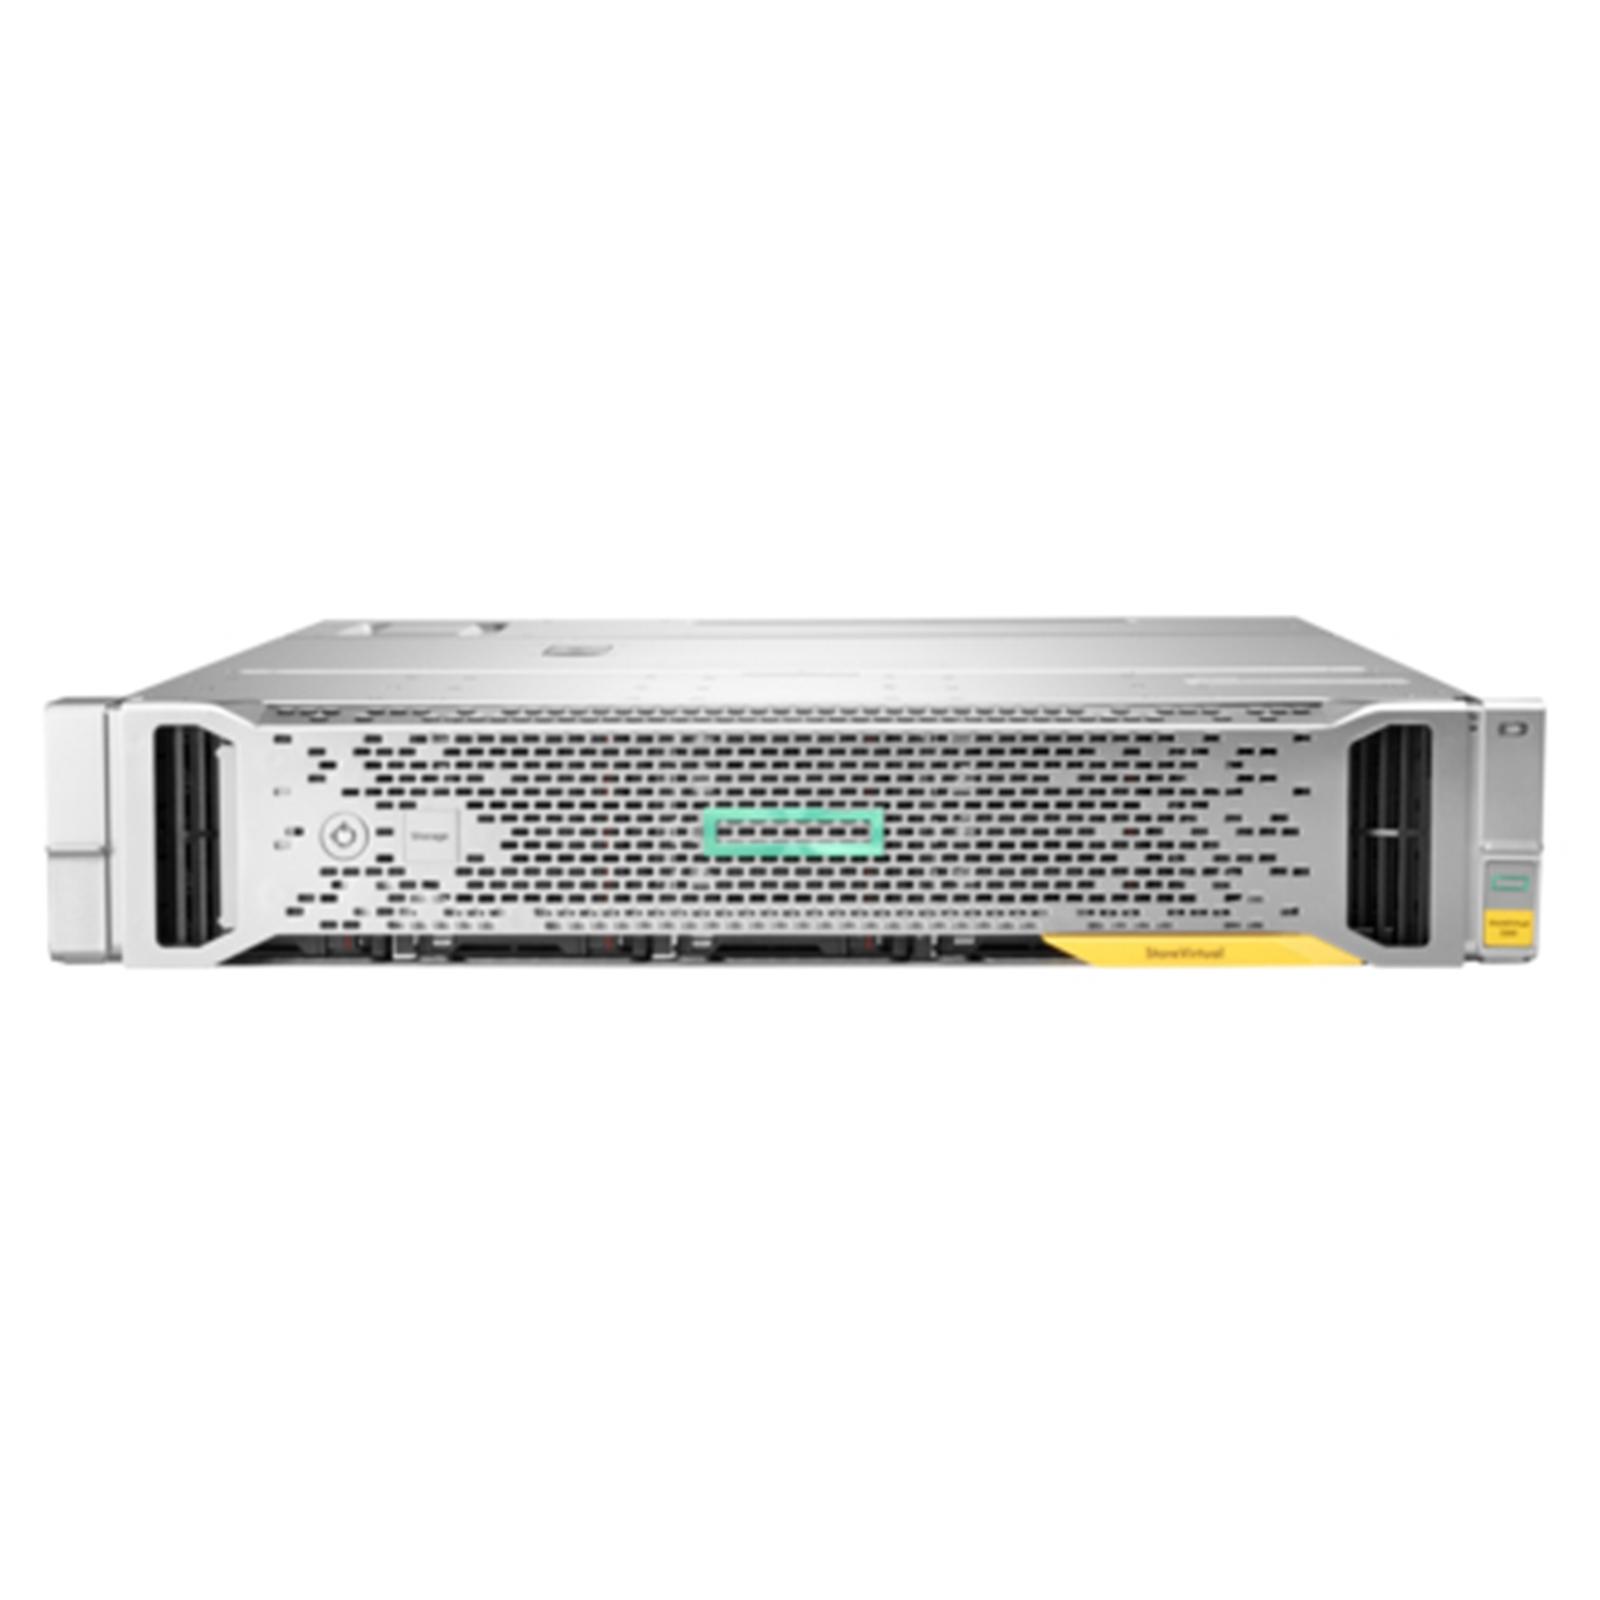 HPE SAN Storage N9X20A | Servers Plus